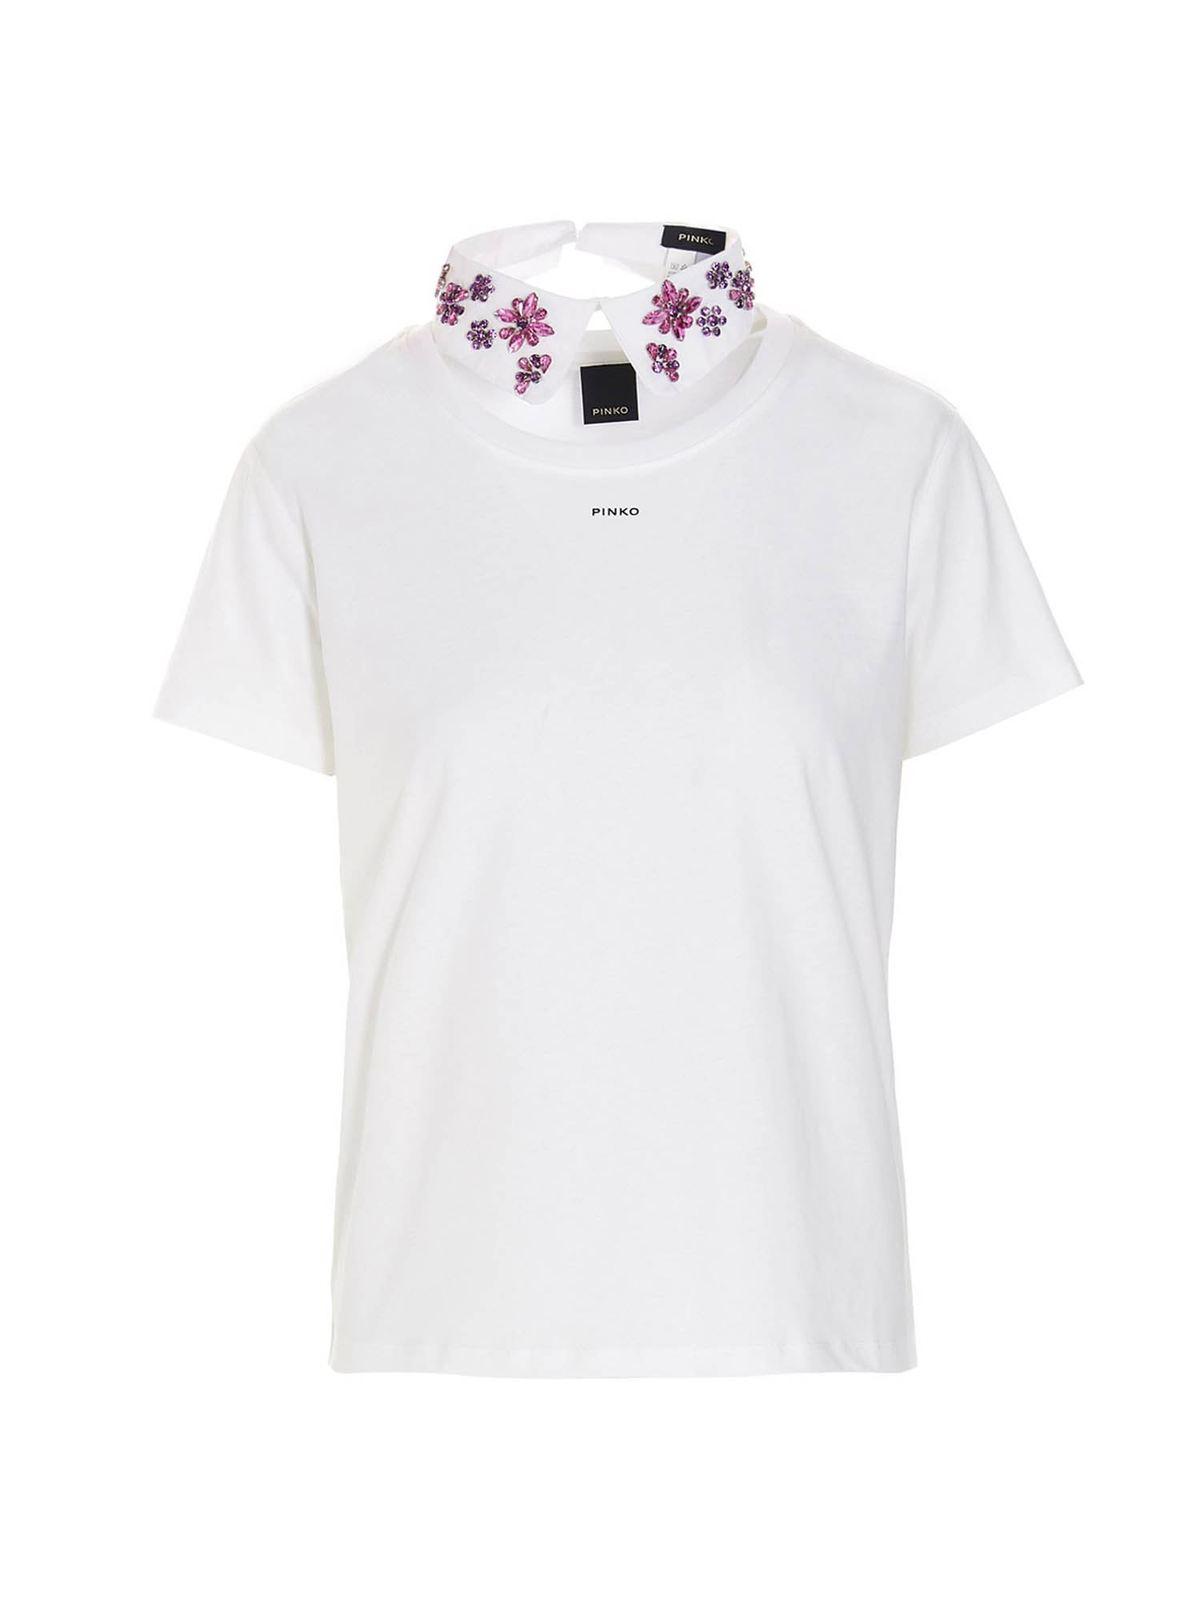 Pinko T-shirts JEWEL COLLAR T-SHIRT IN WHITE